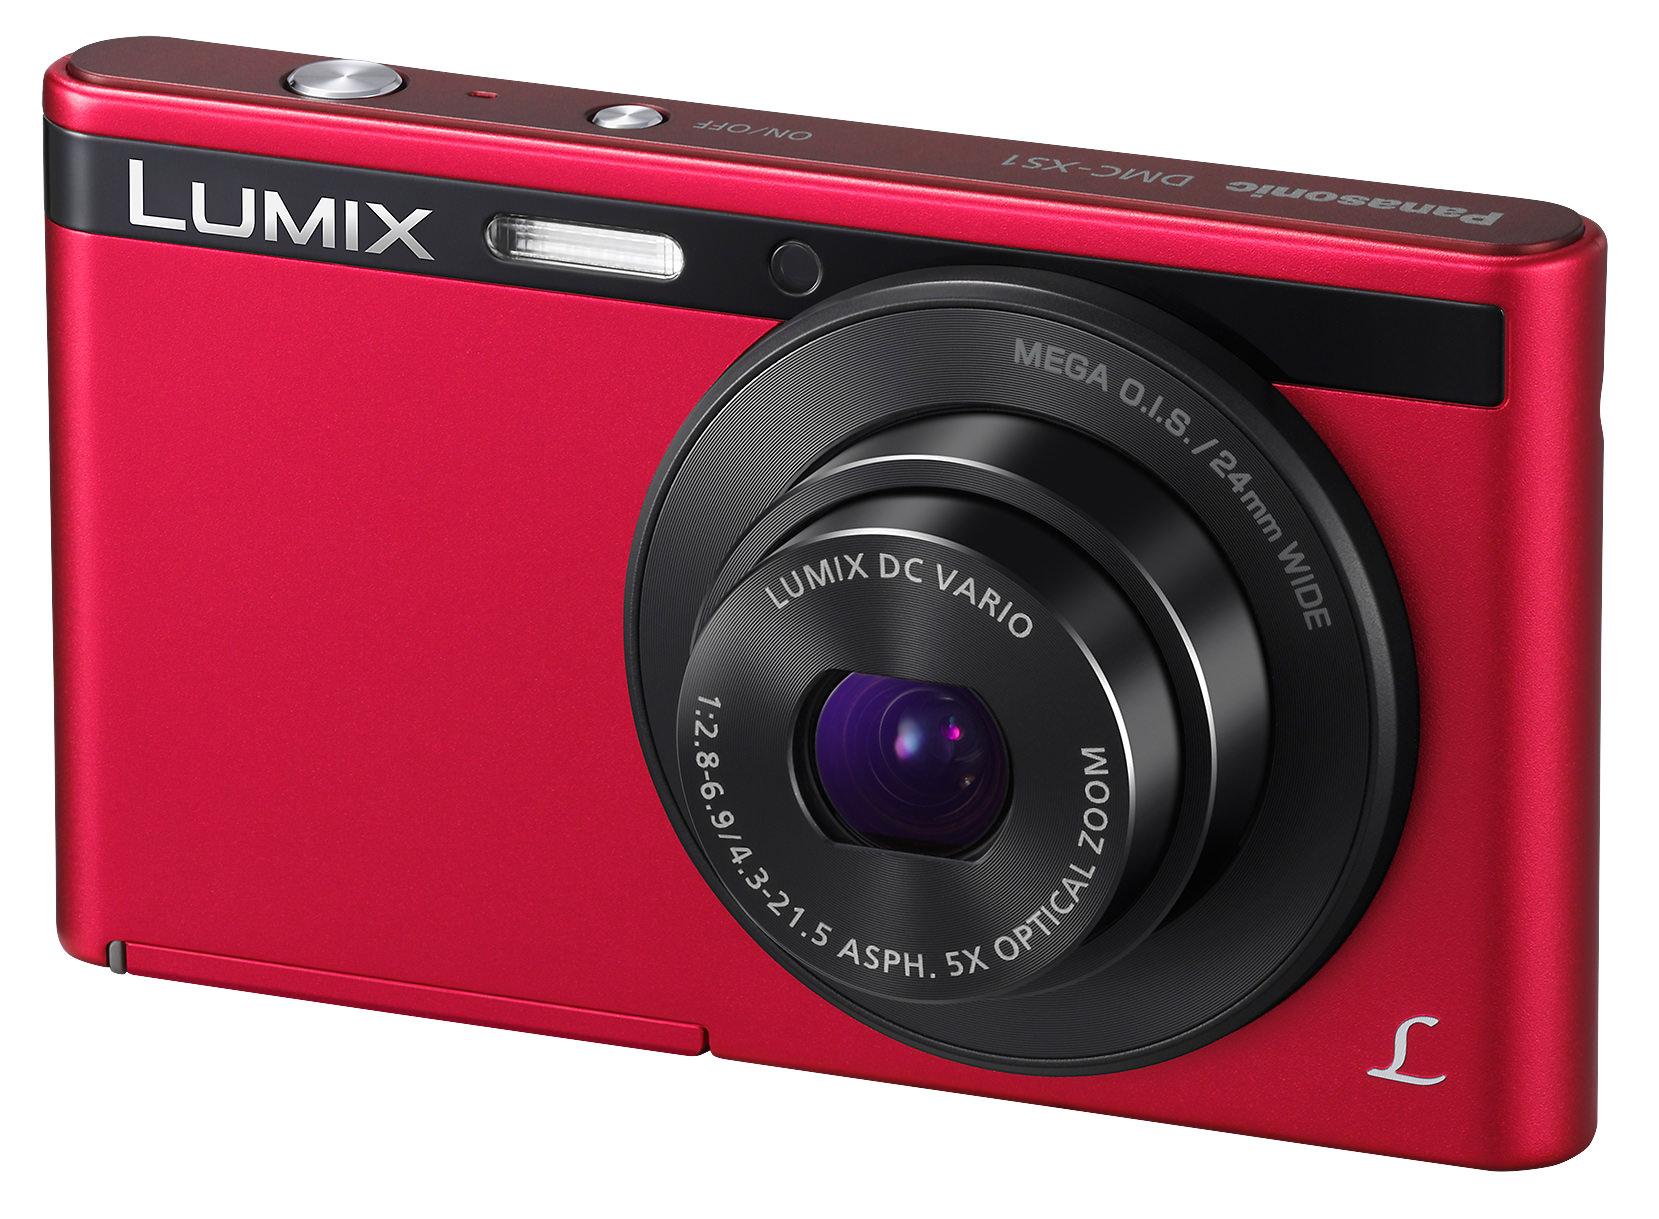 Panasonic Lumix XS1 FS50 F5 Compact Cameras Announced